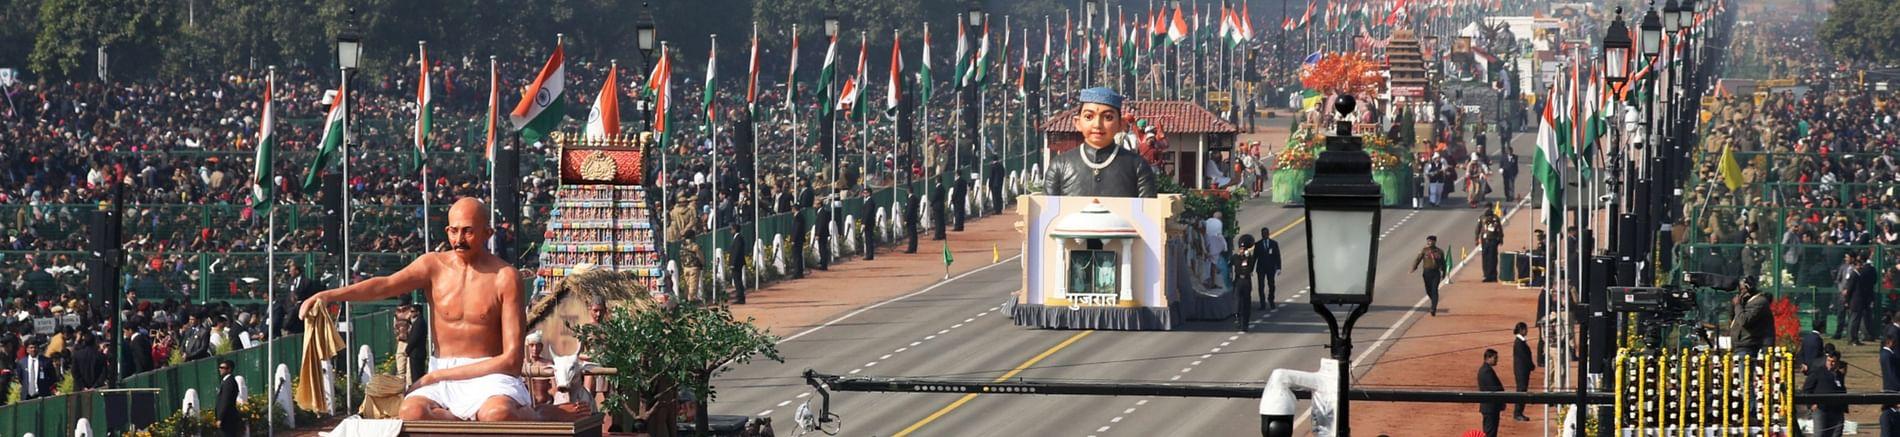 NSG commandos, CRPF tableau part of Republic Day parade 2021